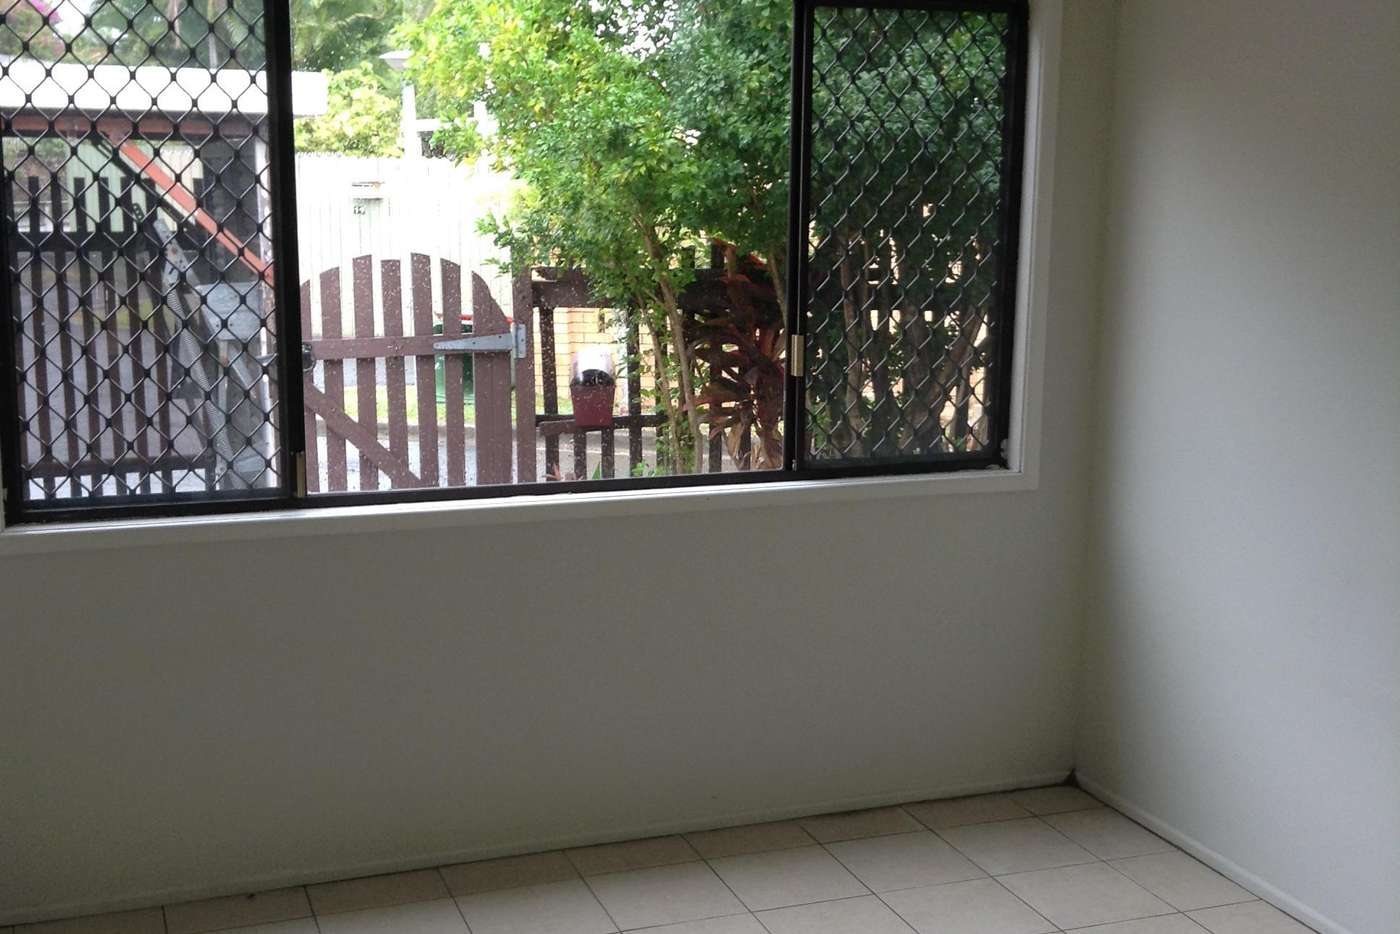 Seventh view of Homely unit listing, 17/57 NORTH ROAD, Woodridge QLD 4114